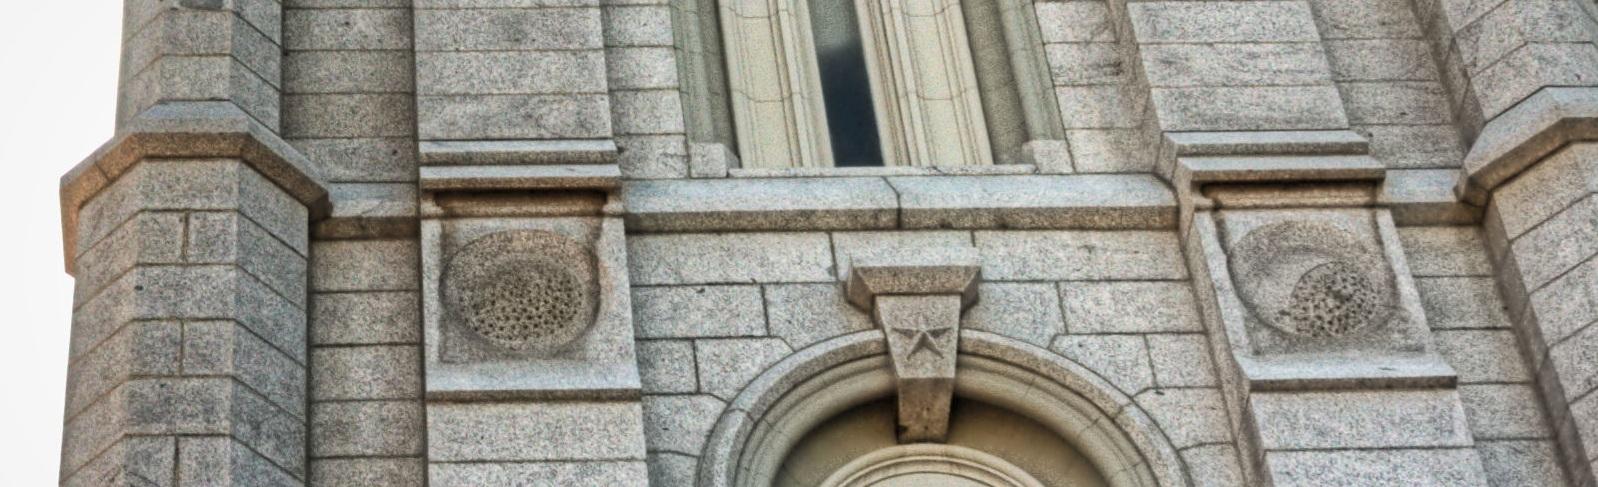 The Trumpet Stone Latter Day Saint Temple Symbols Moonstones